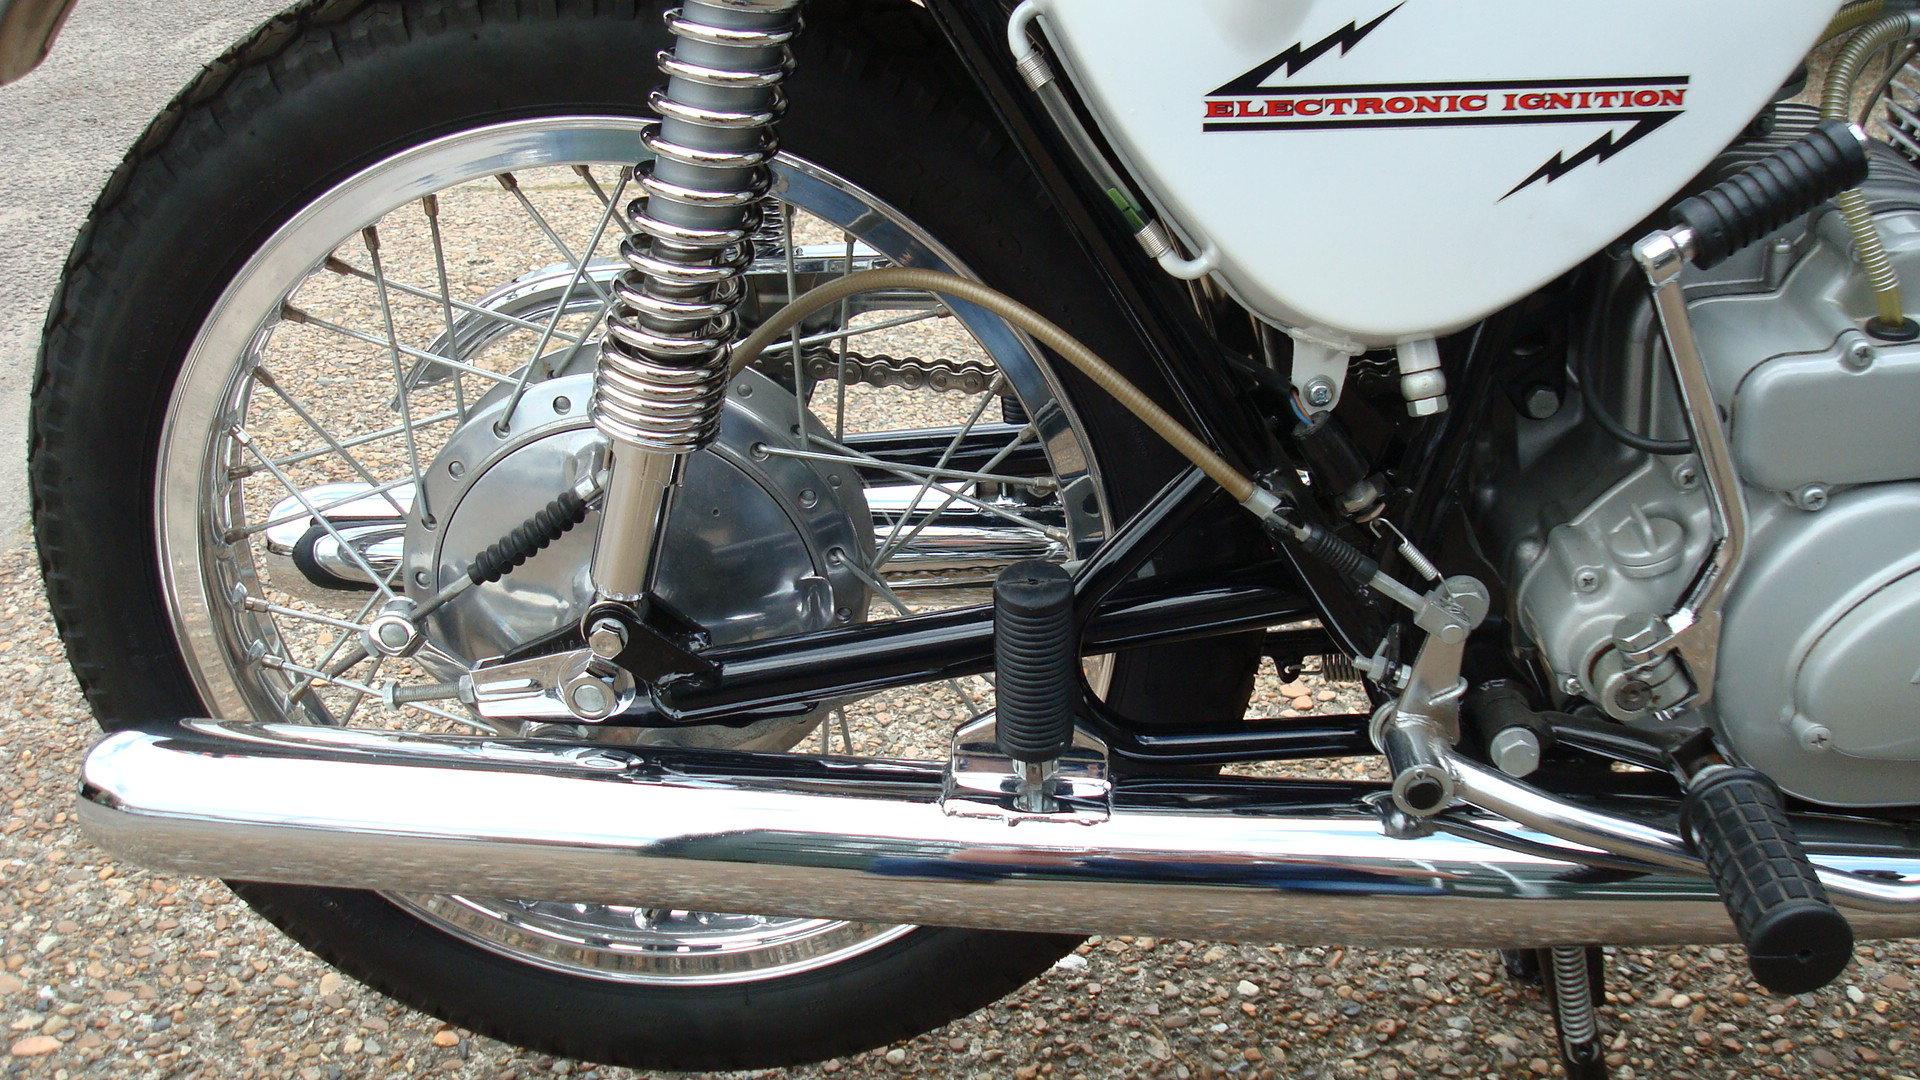 Kawasaki A1A Samurai 250 1970-J **SHOW STANDARD,RESTORED** For Sale (picture 4 of 6)